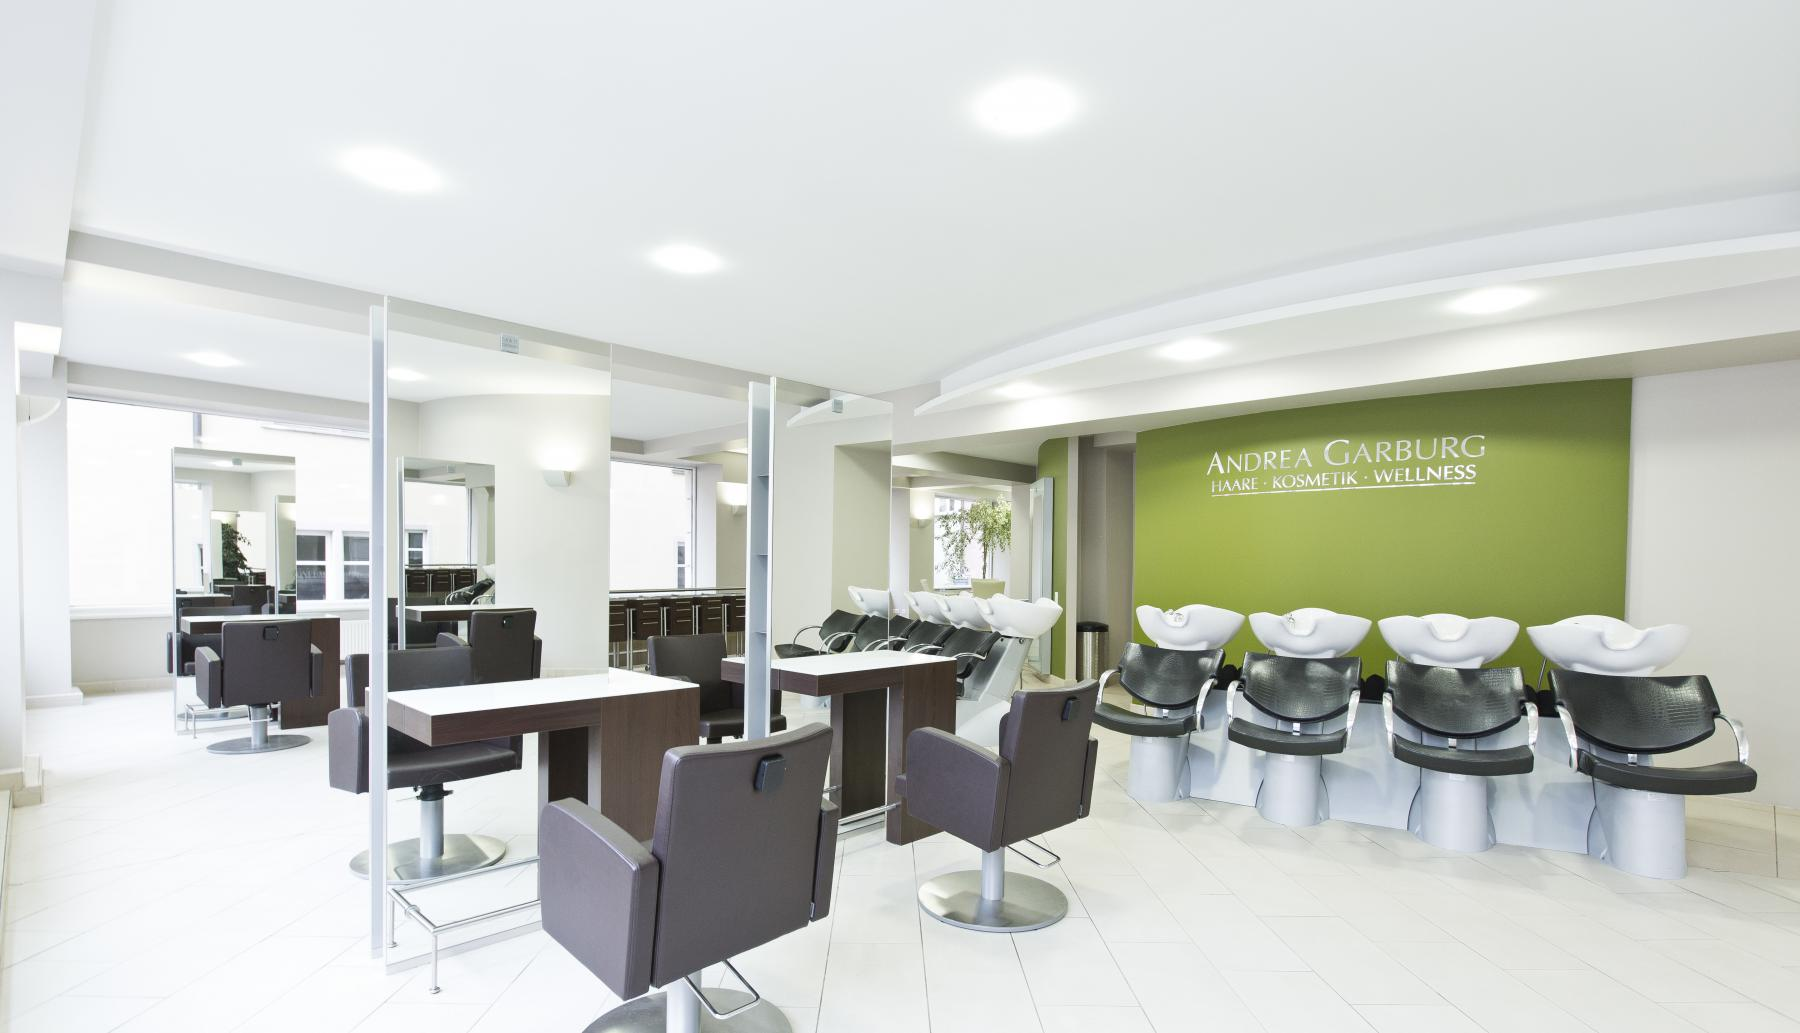 andrea garburg haare kosmetik wellness in regensburg. Black Bedroom Furniture Sets. Home Design Ideas